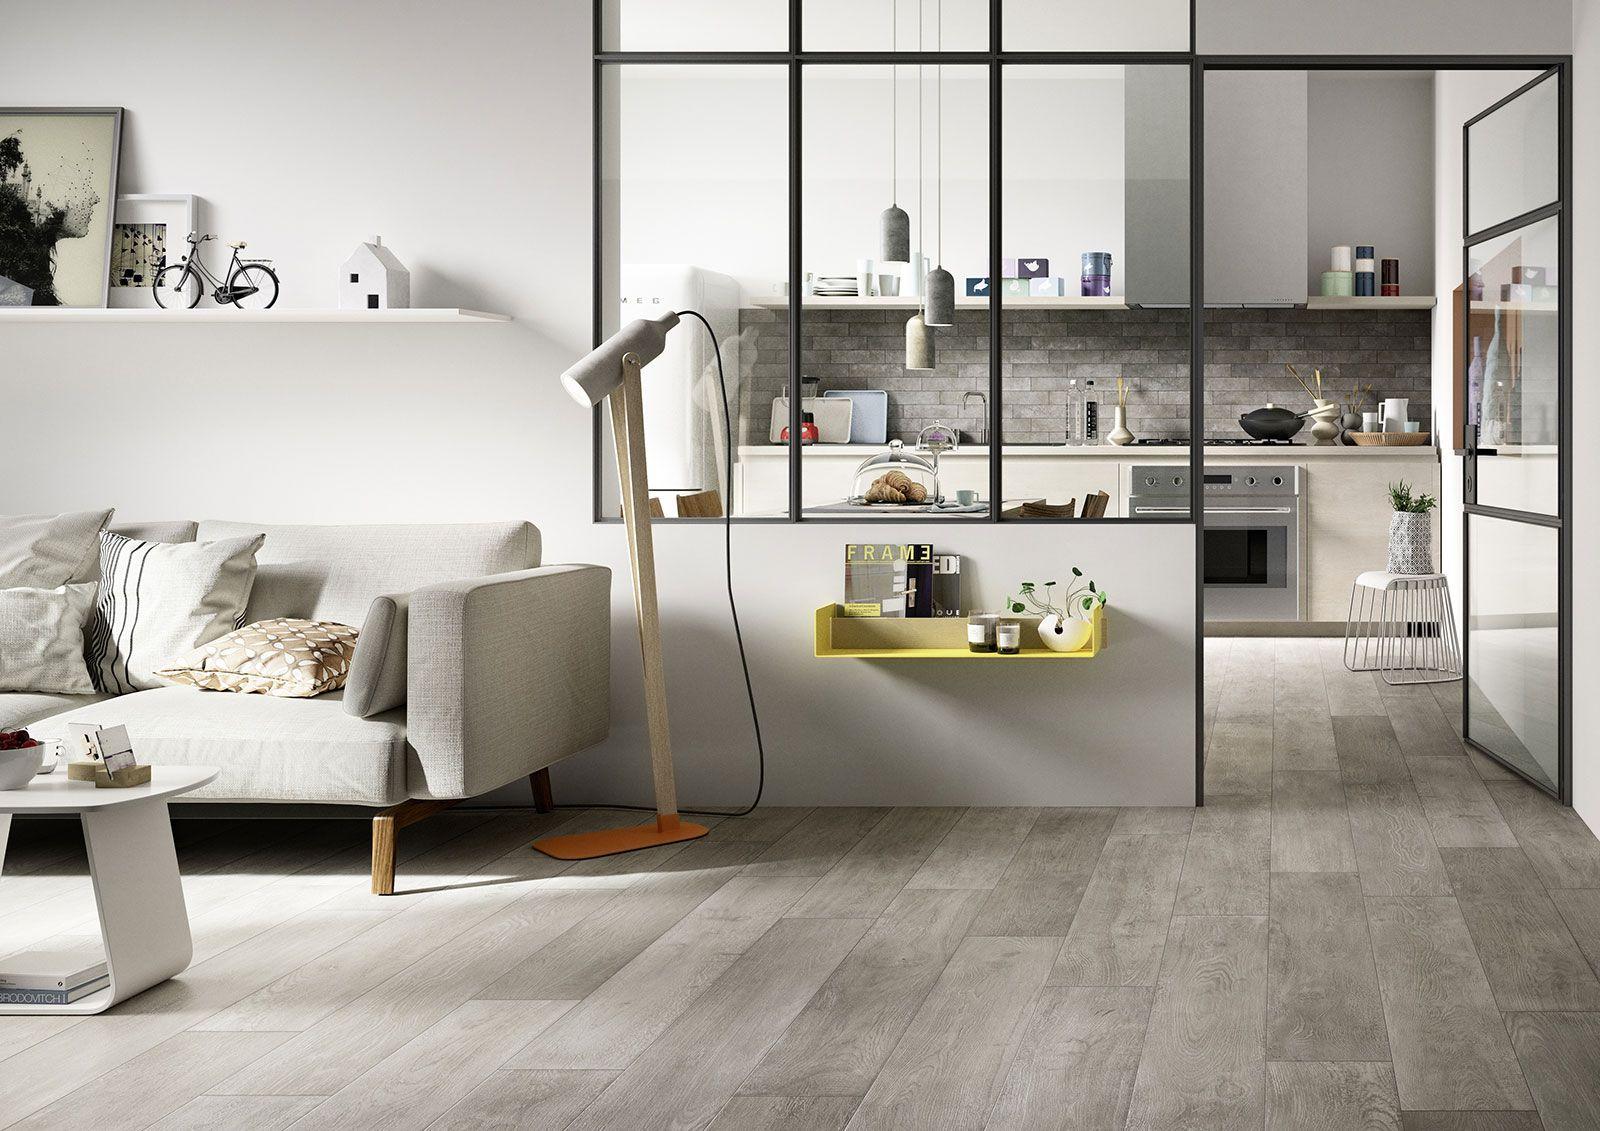 Treverktime u2013 piastrelle per pavimento effetto legno marazzi